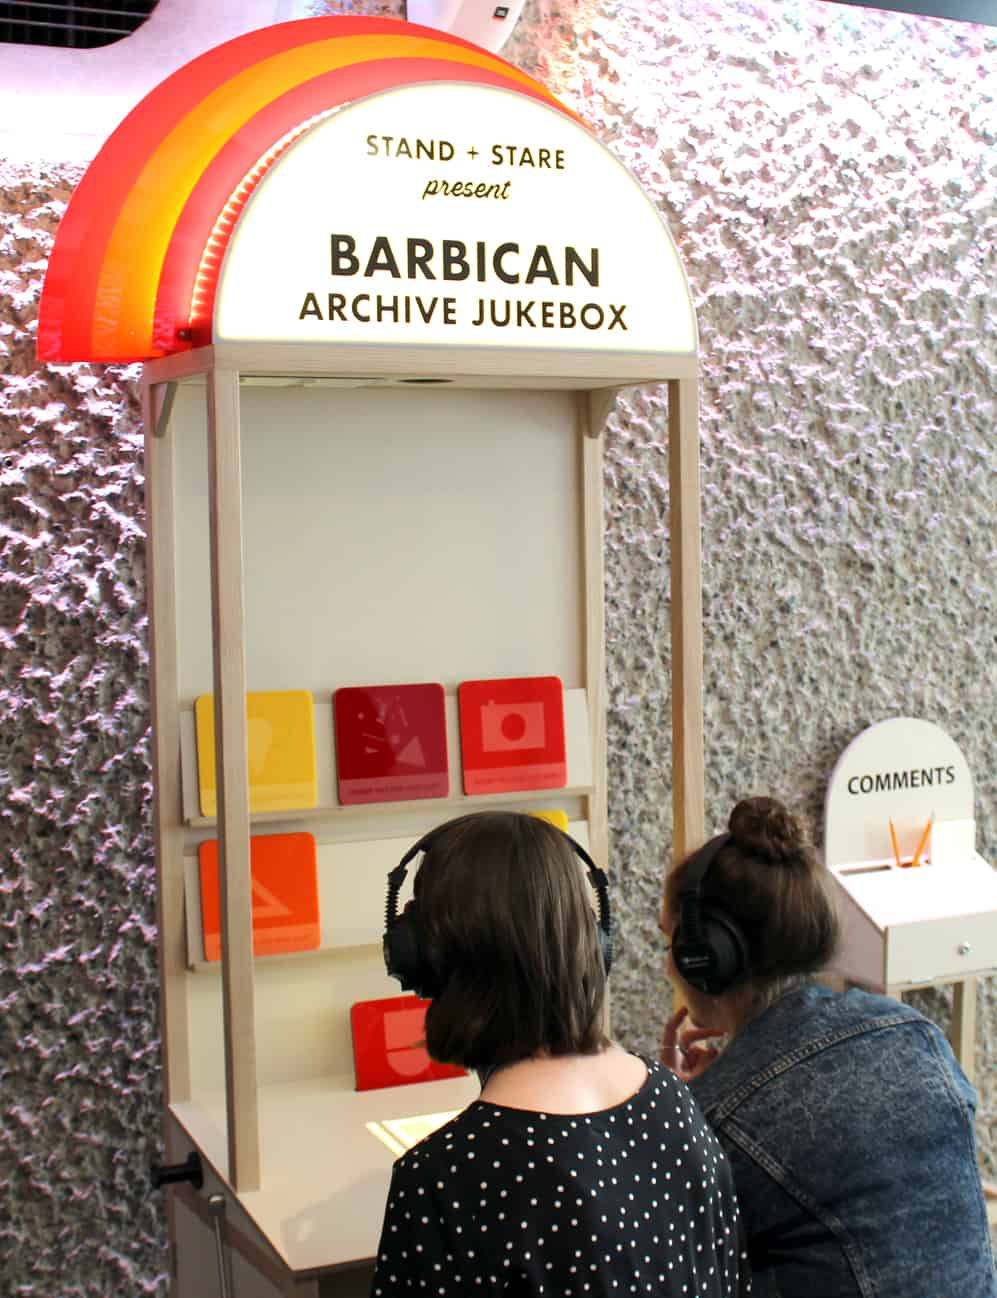 Two Visitors using MKII Headphones at Barbican Archive Jukebox